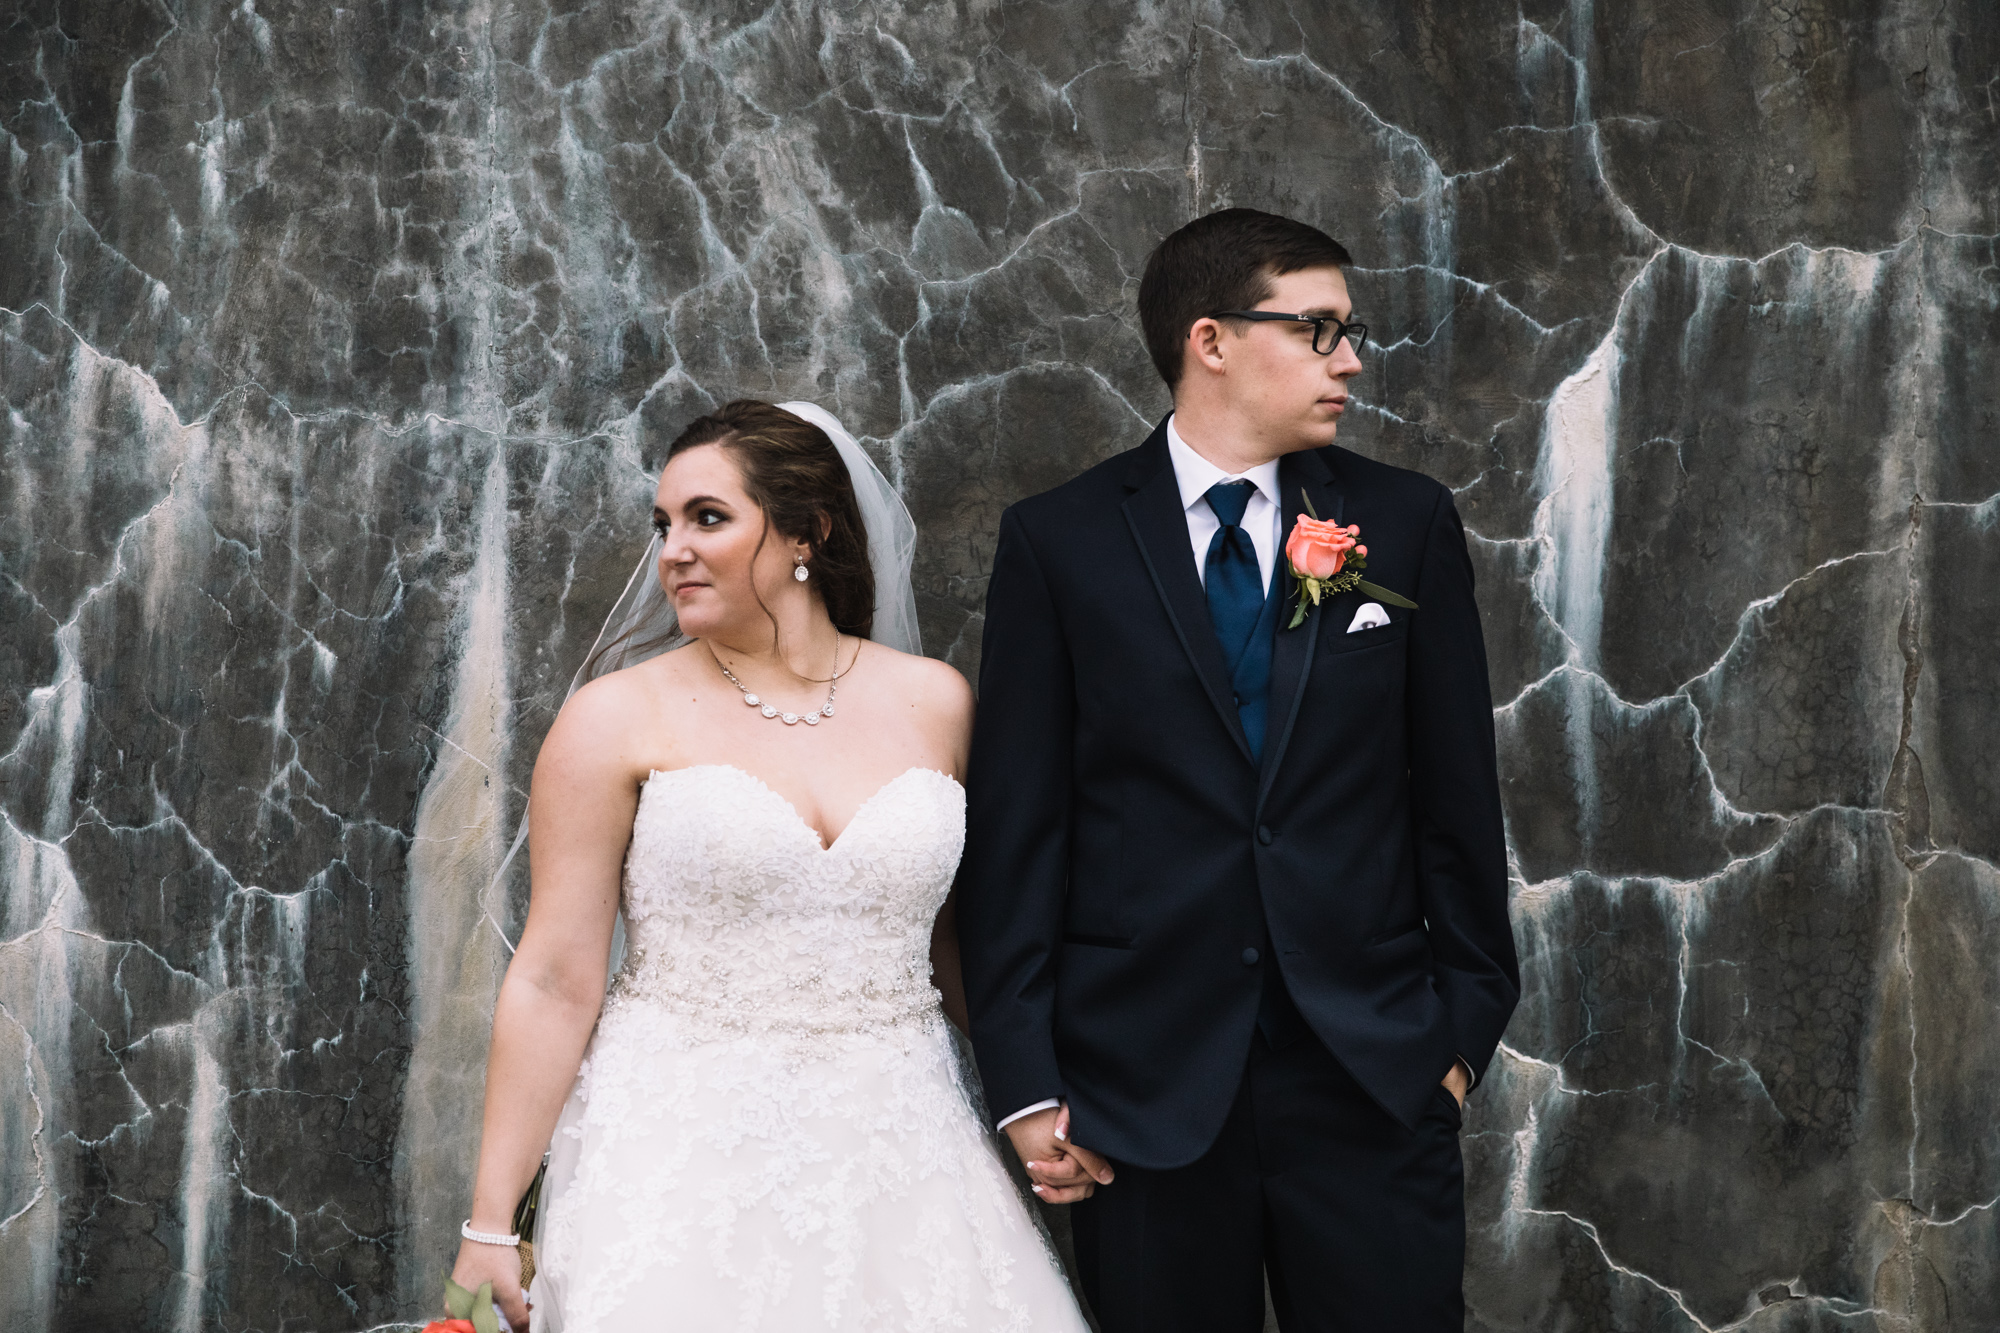 W&V_Wedding_Portraits-8.jpg